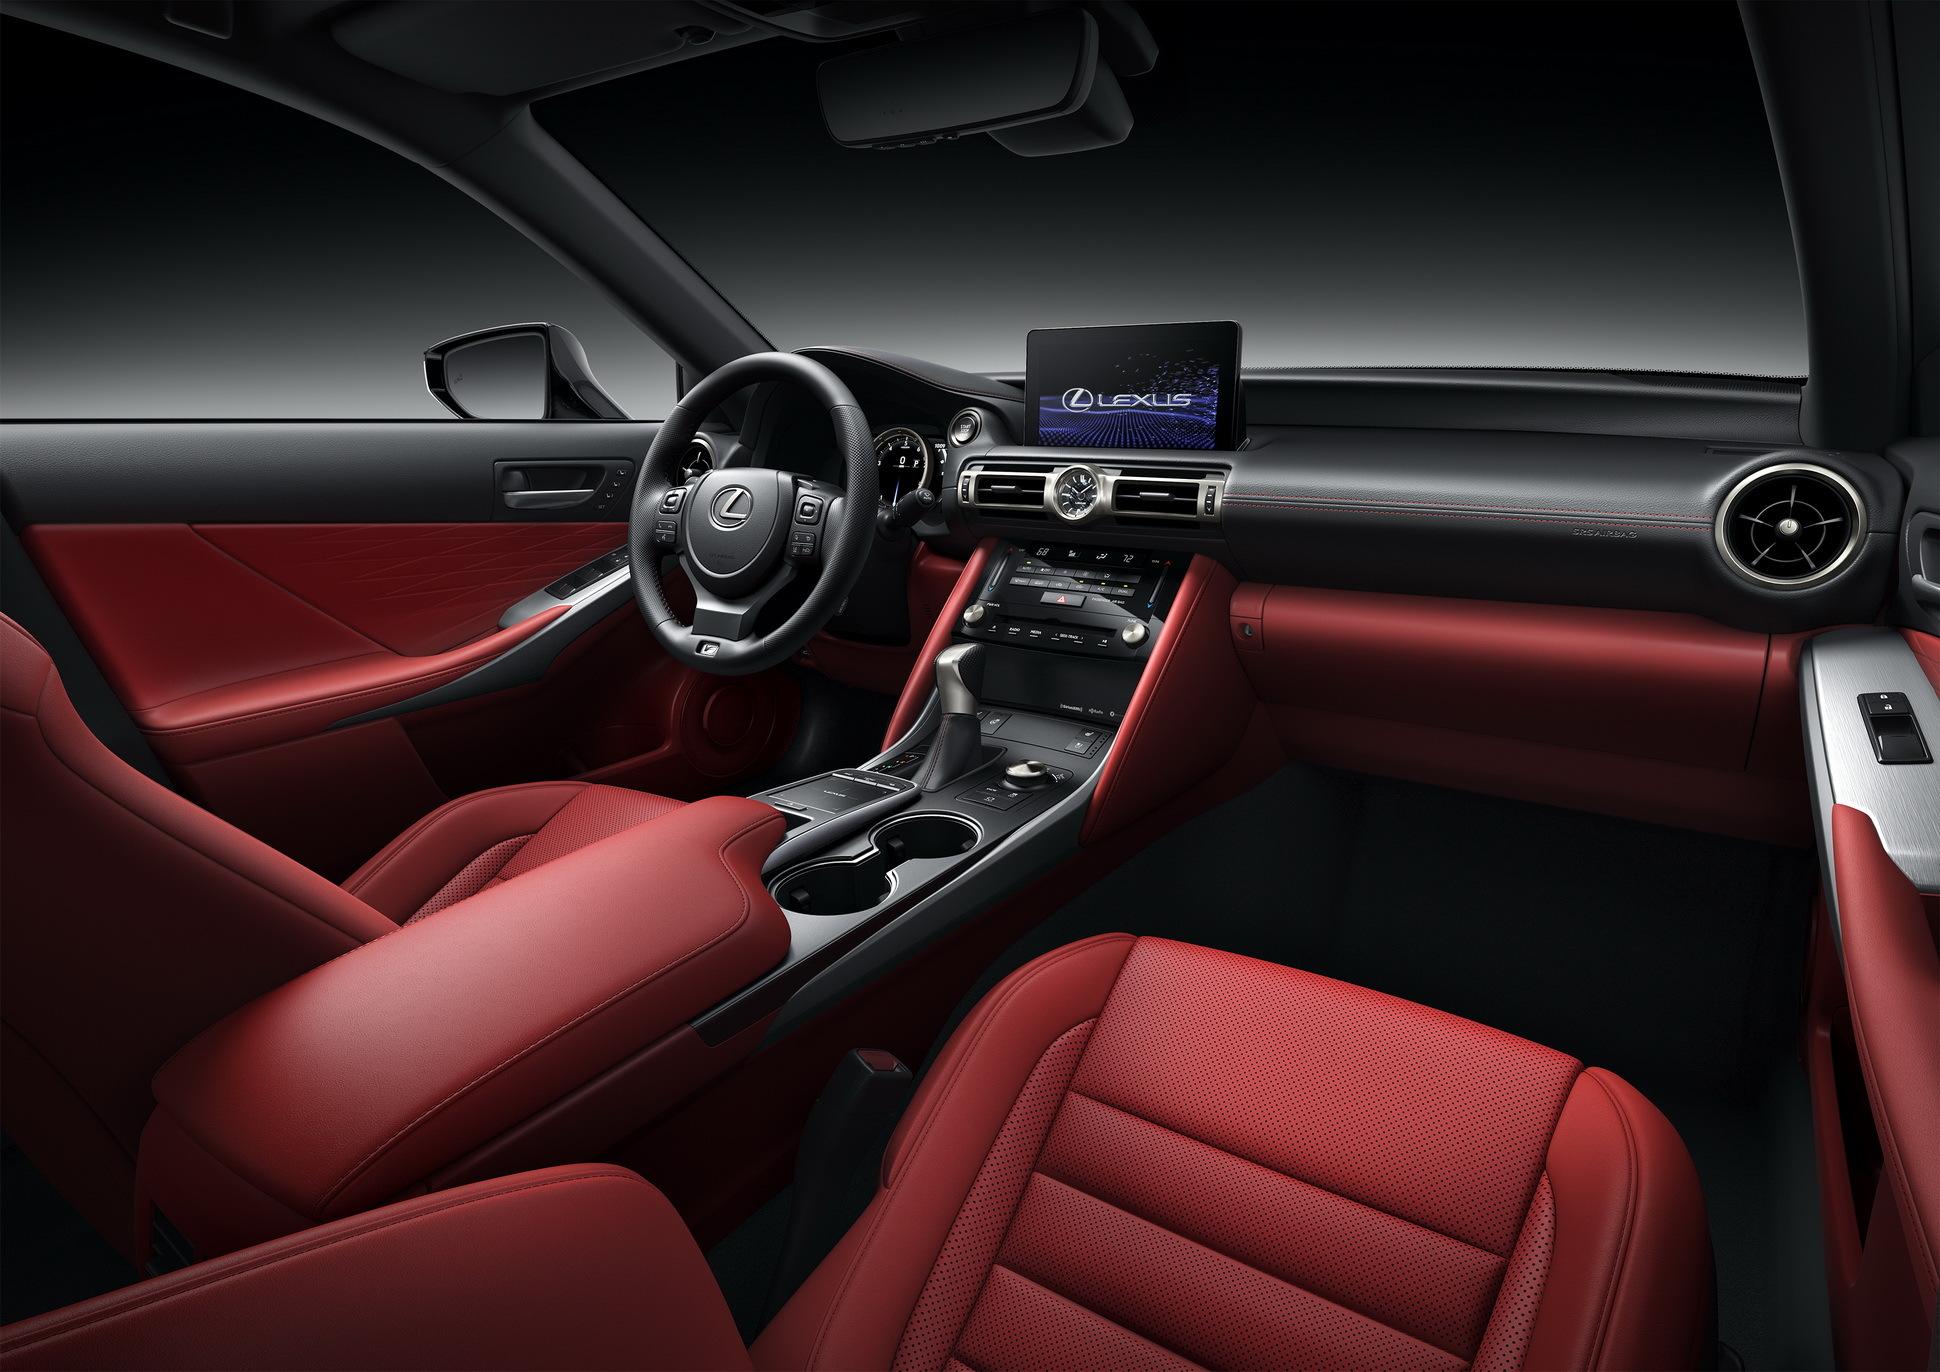 noi-that-Lexus-IS-2021-danhgiaxehoi-vn